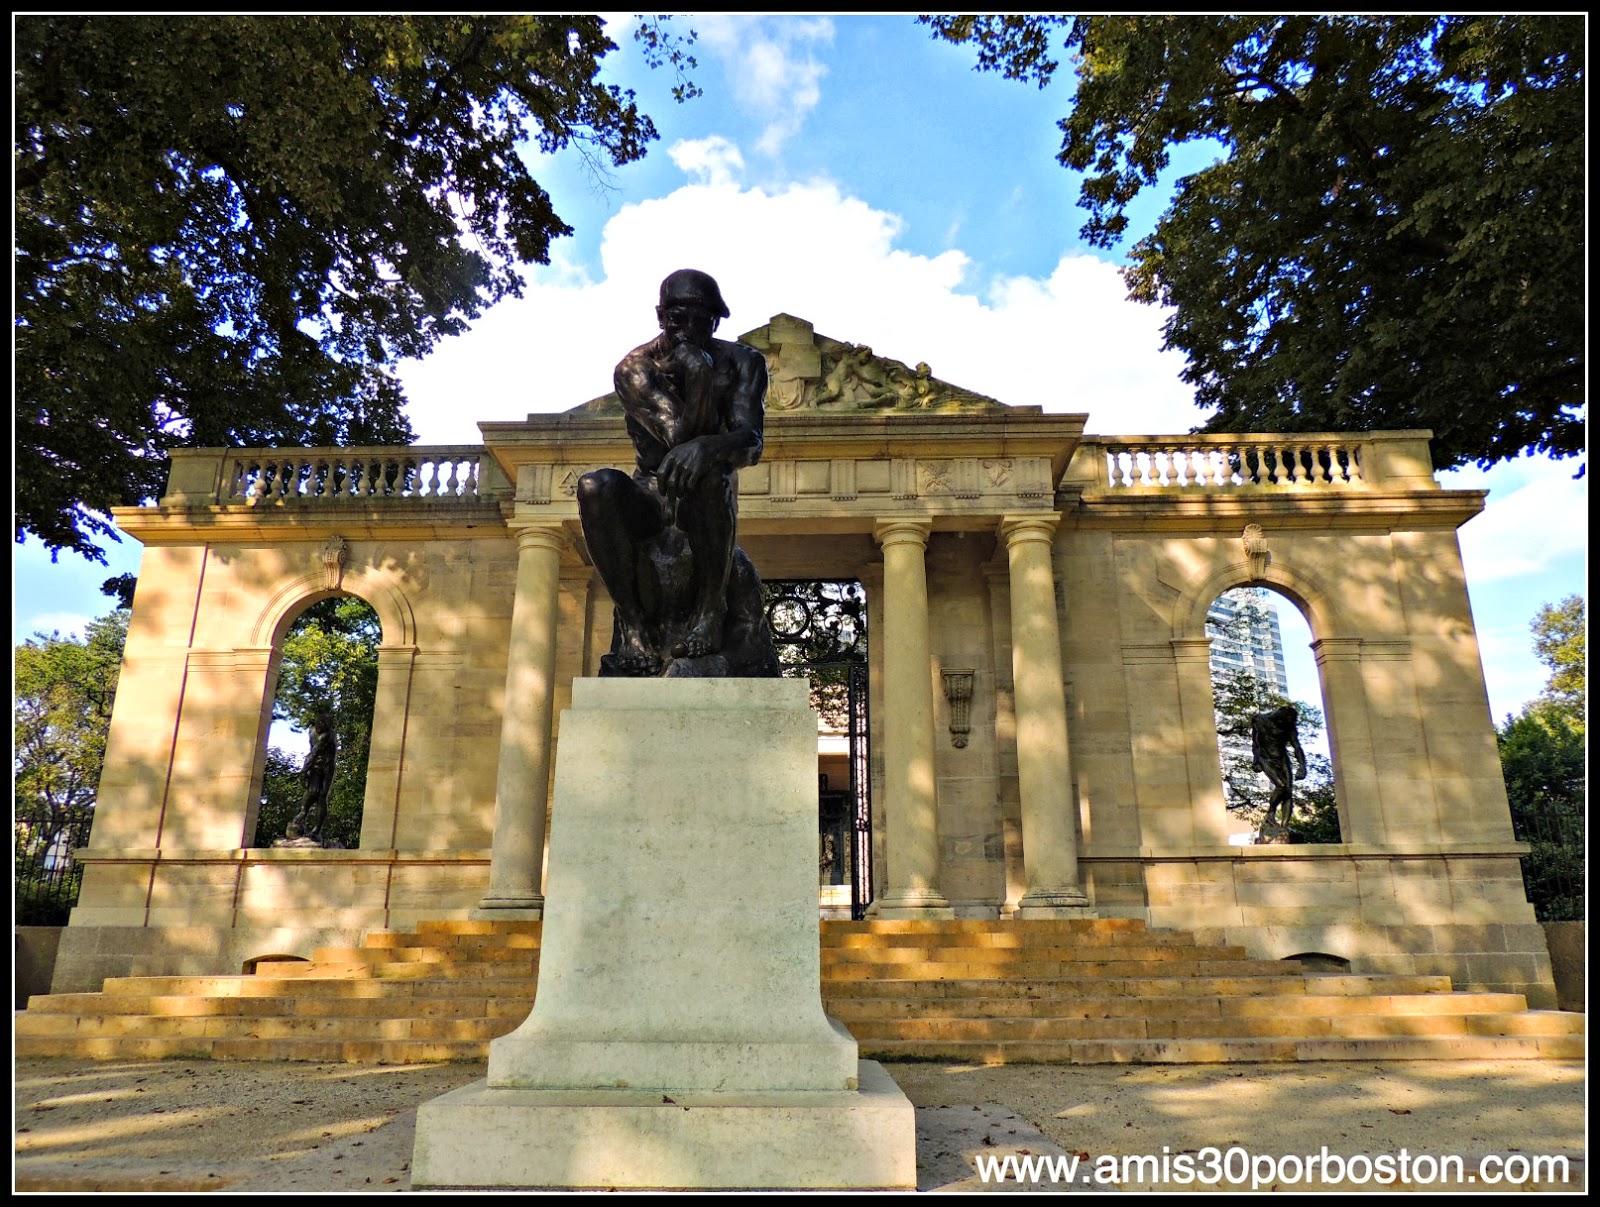 Filadelfia: El Pensador de Rodin